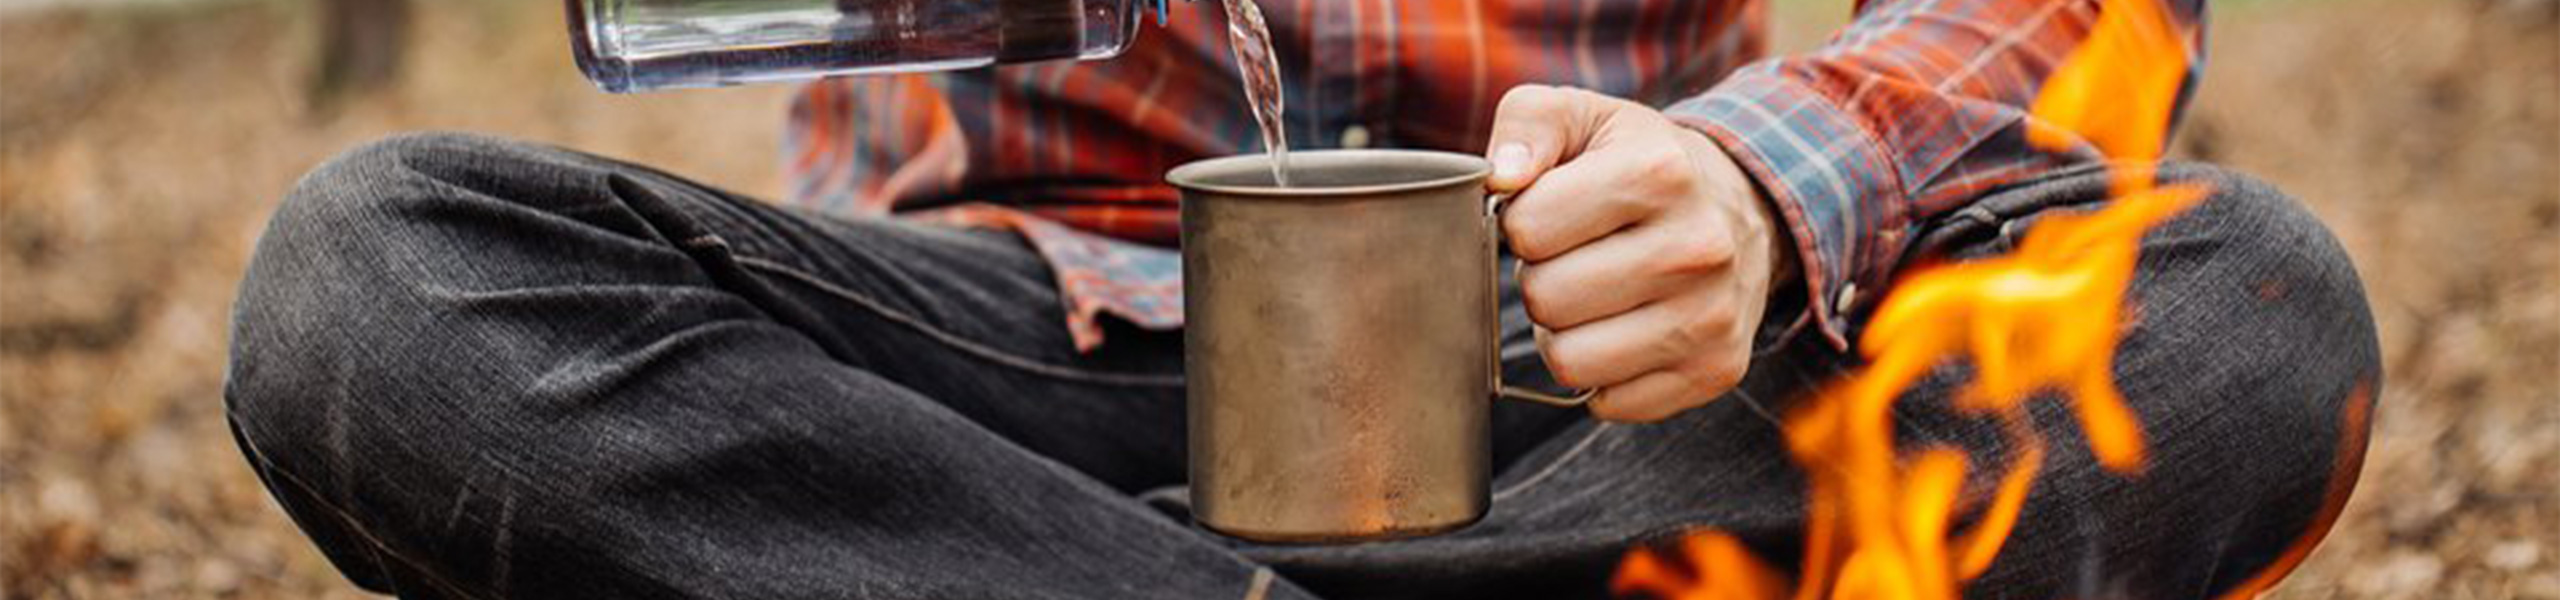 5 Scandinavian secrets to a happier, healthier life - Thrive